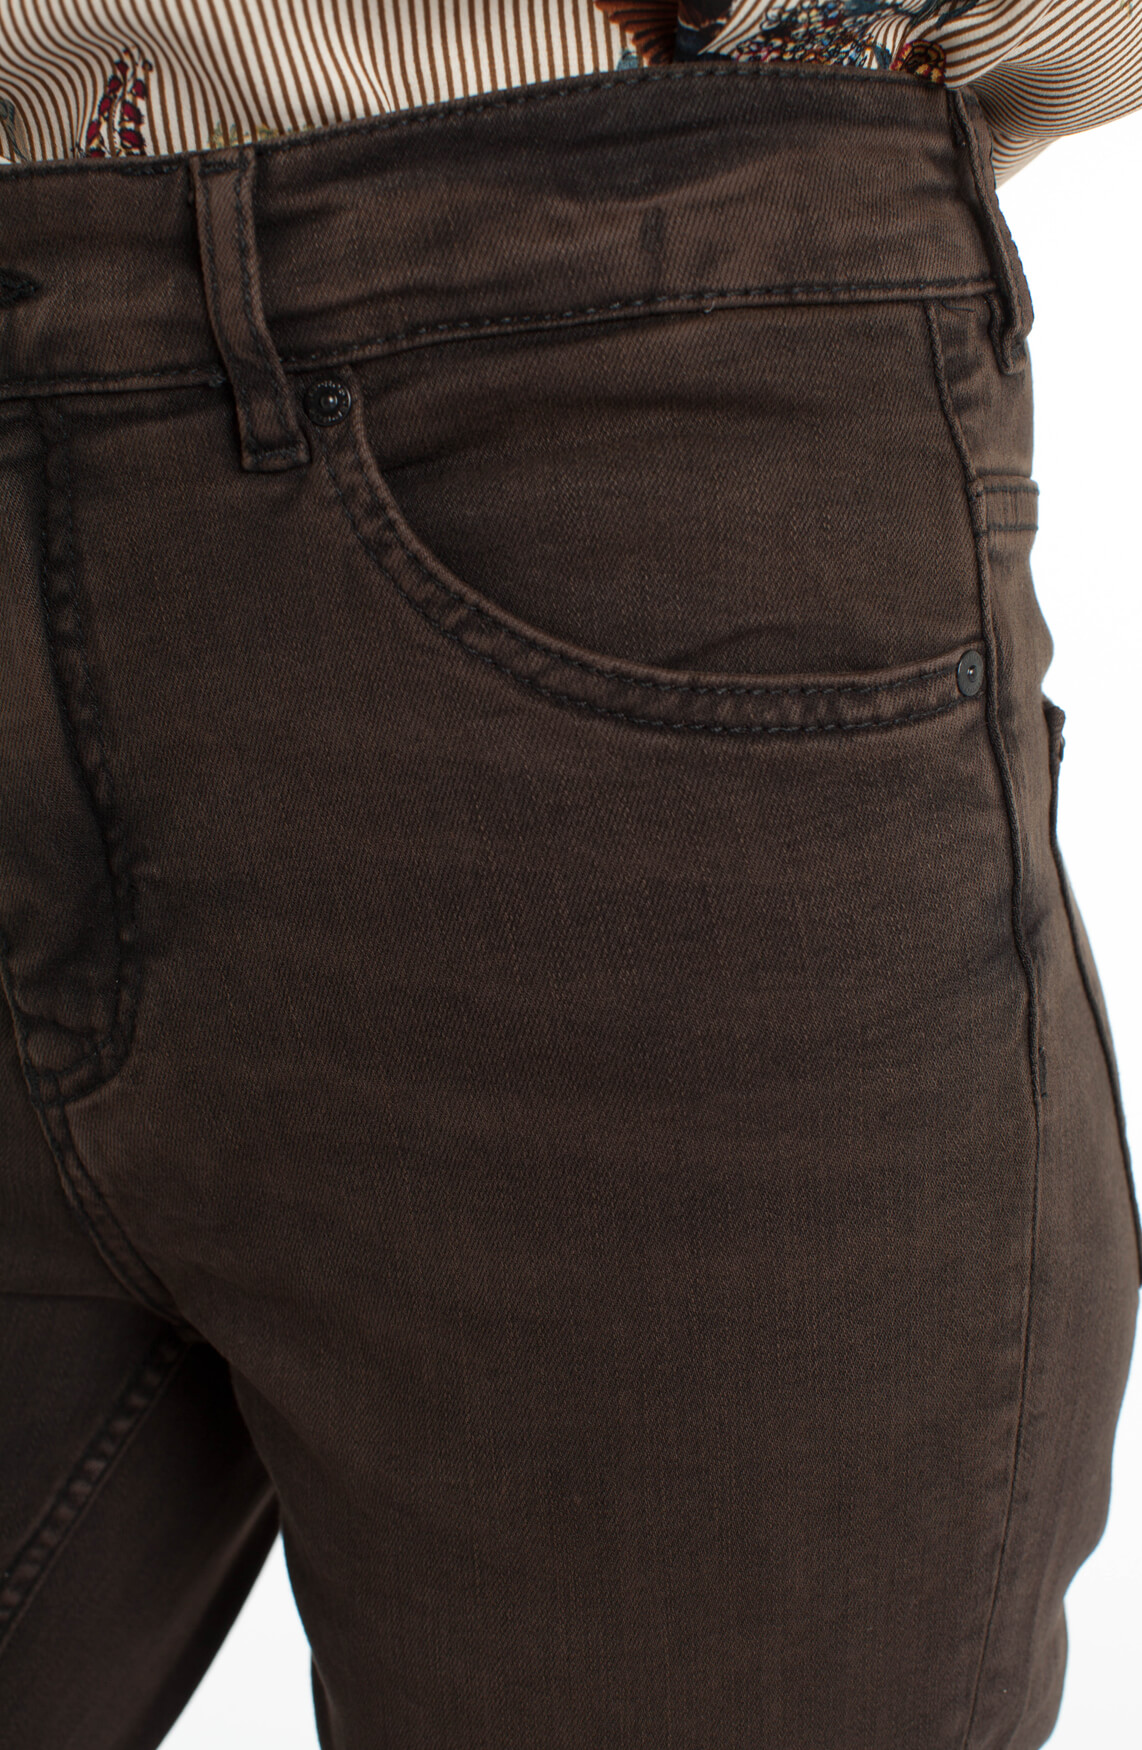 Rosner Dames Antonia skinny jeans Bruin